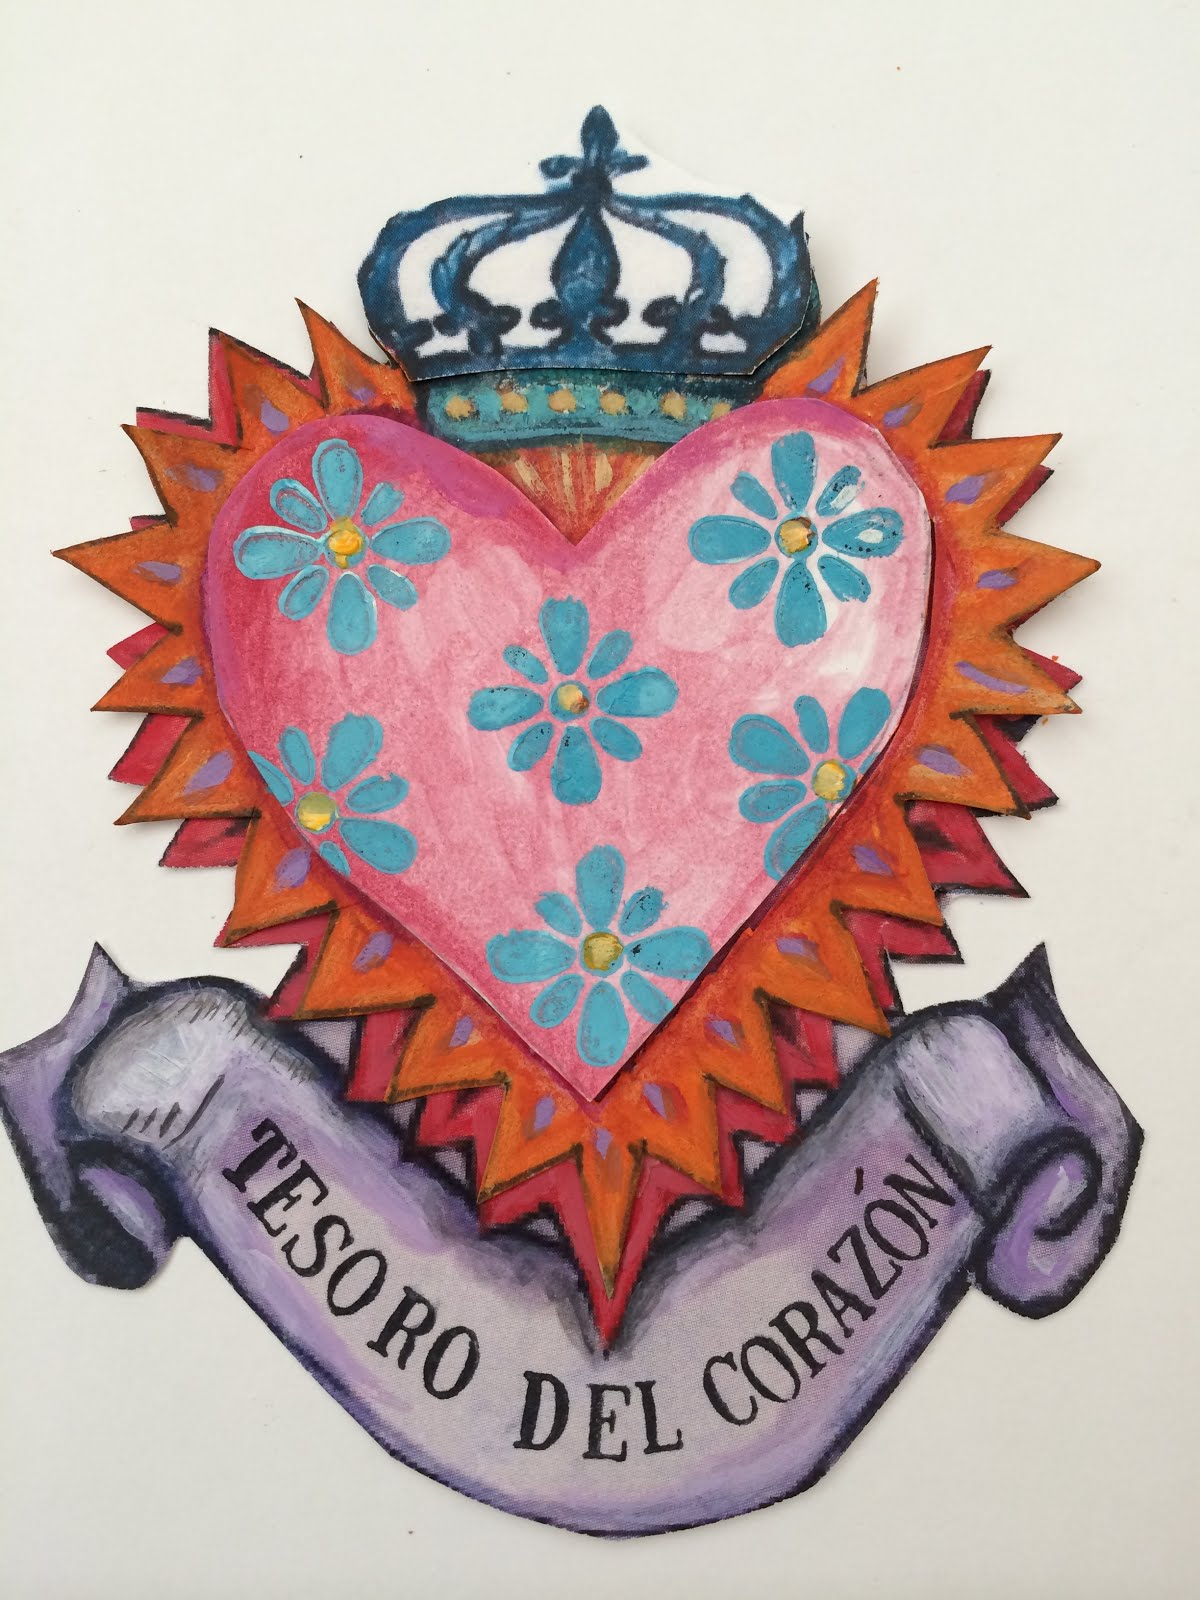 Tesoro Del Corazon